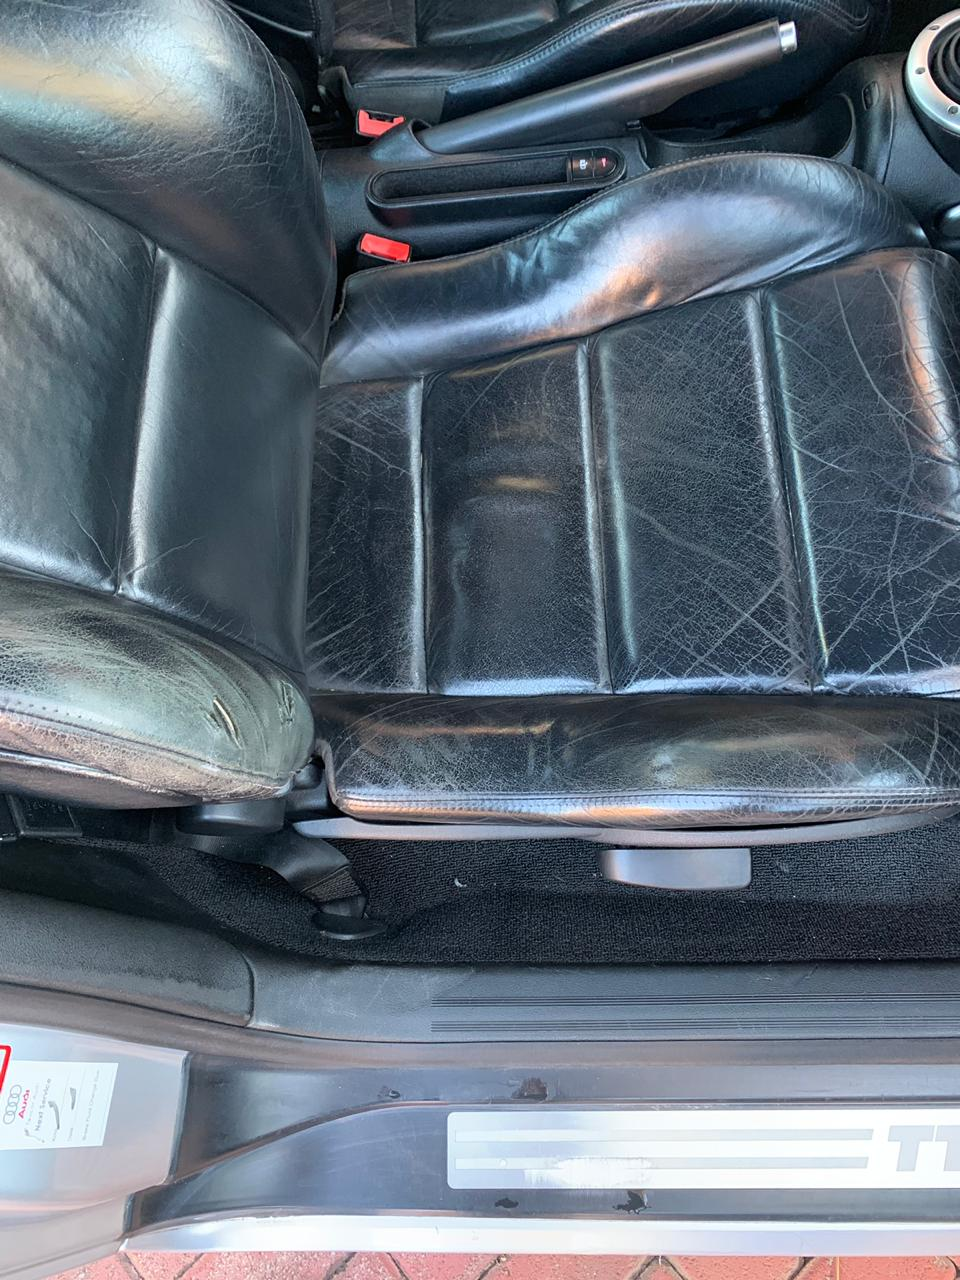 2001 Audi TT coupe 1.8T